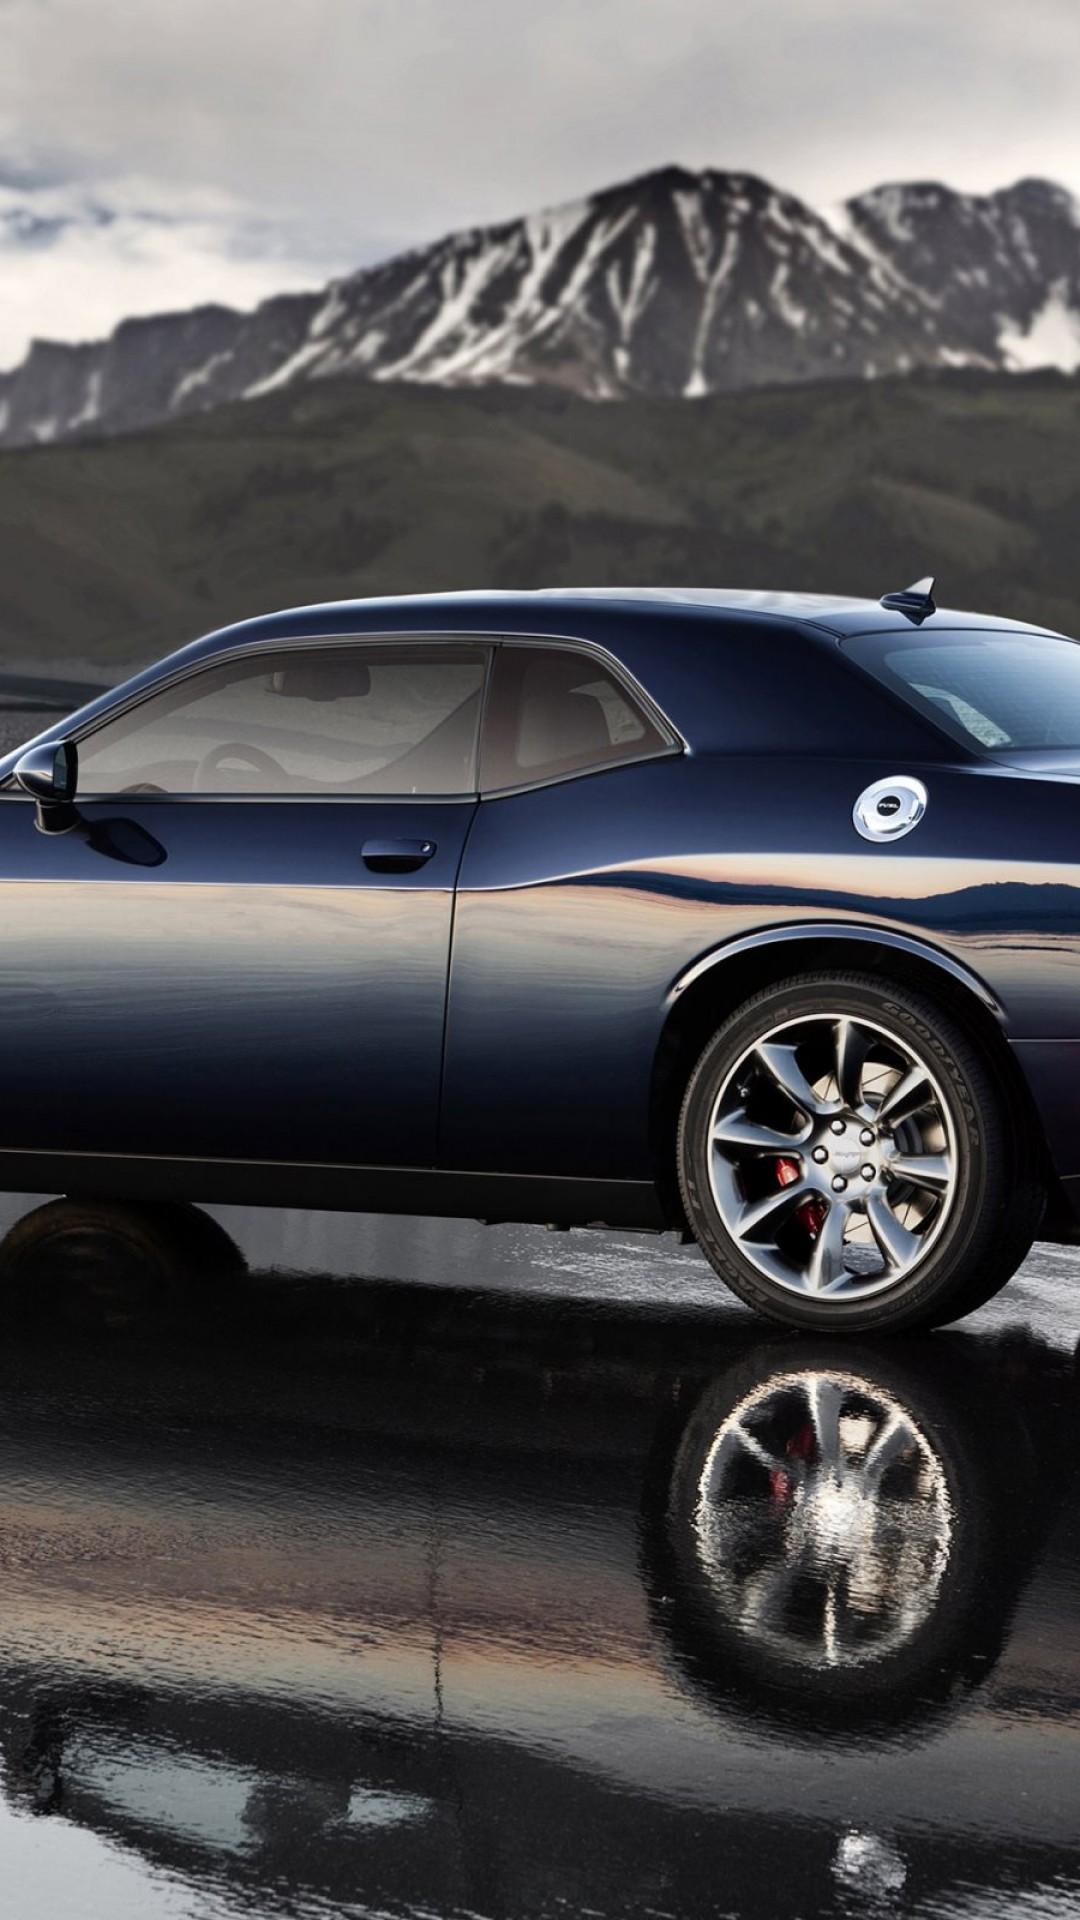 Wallpaper Dodge Challenger Srt Hellcat Top Supercars 2015